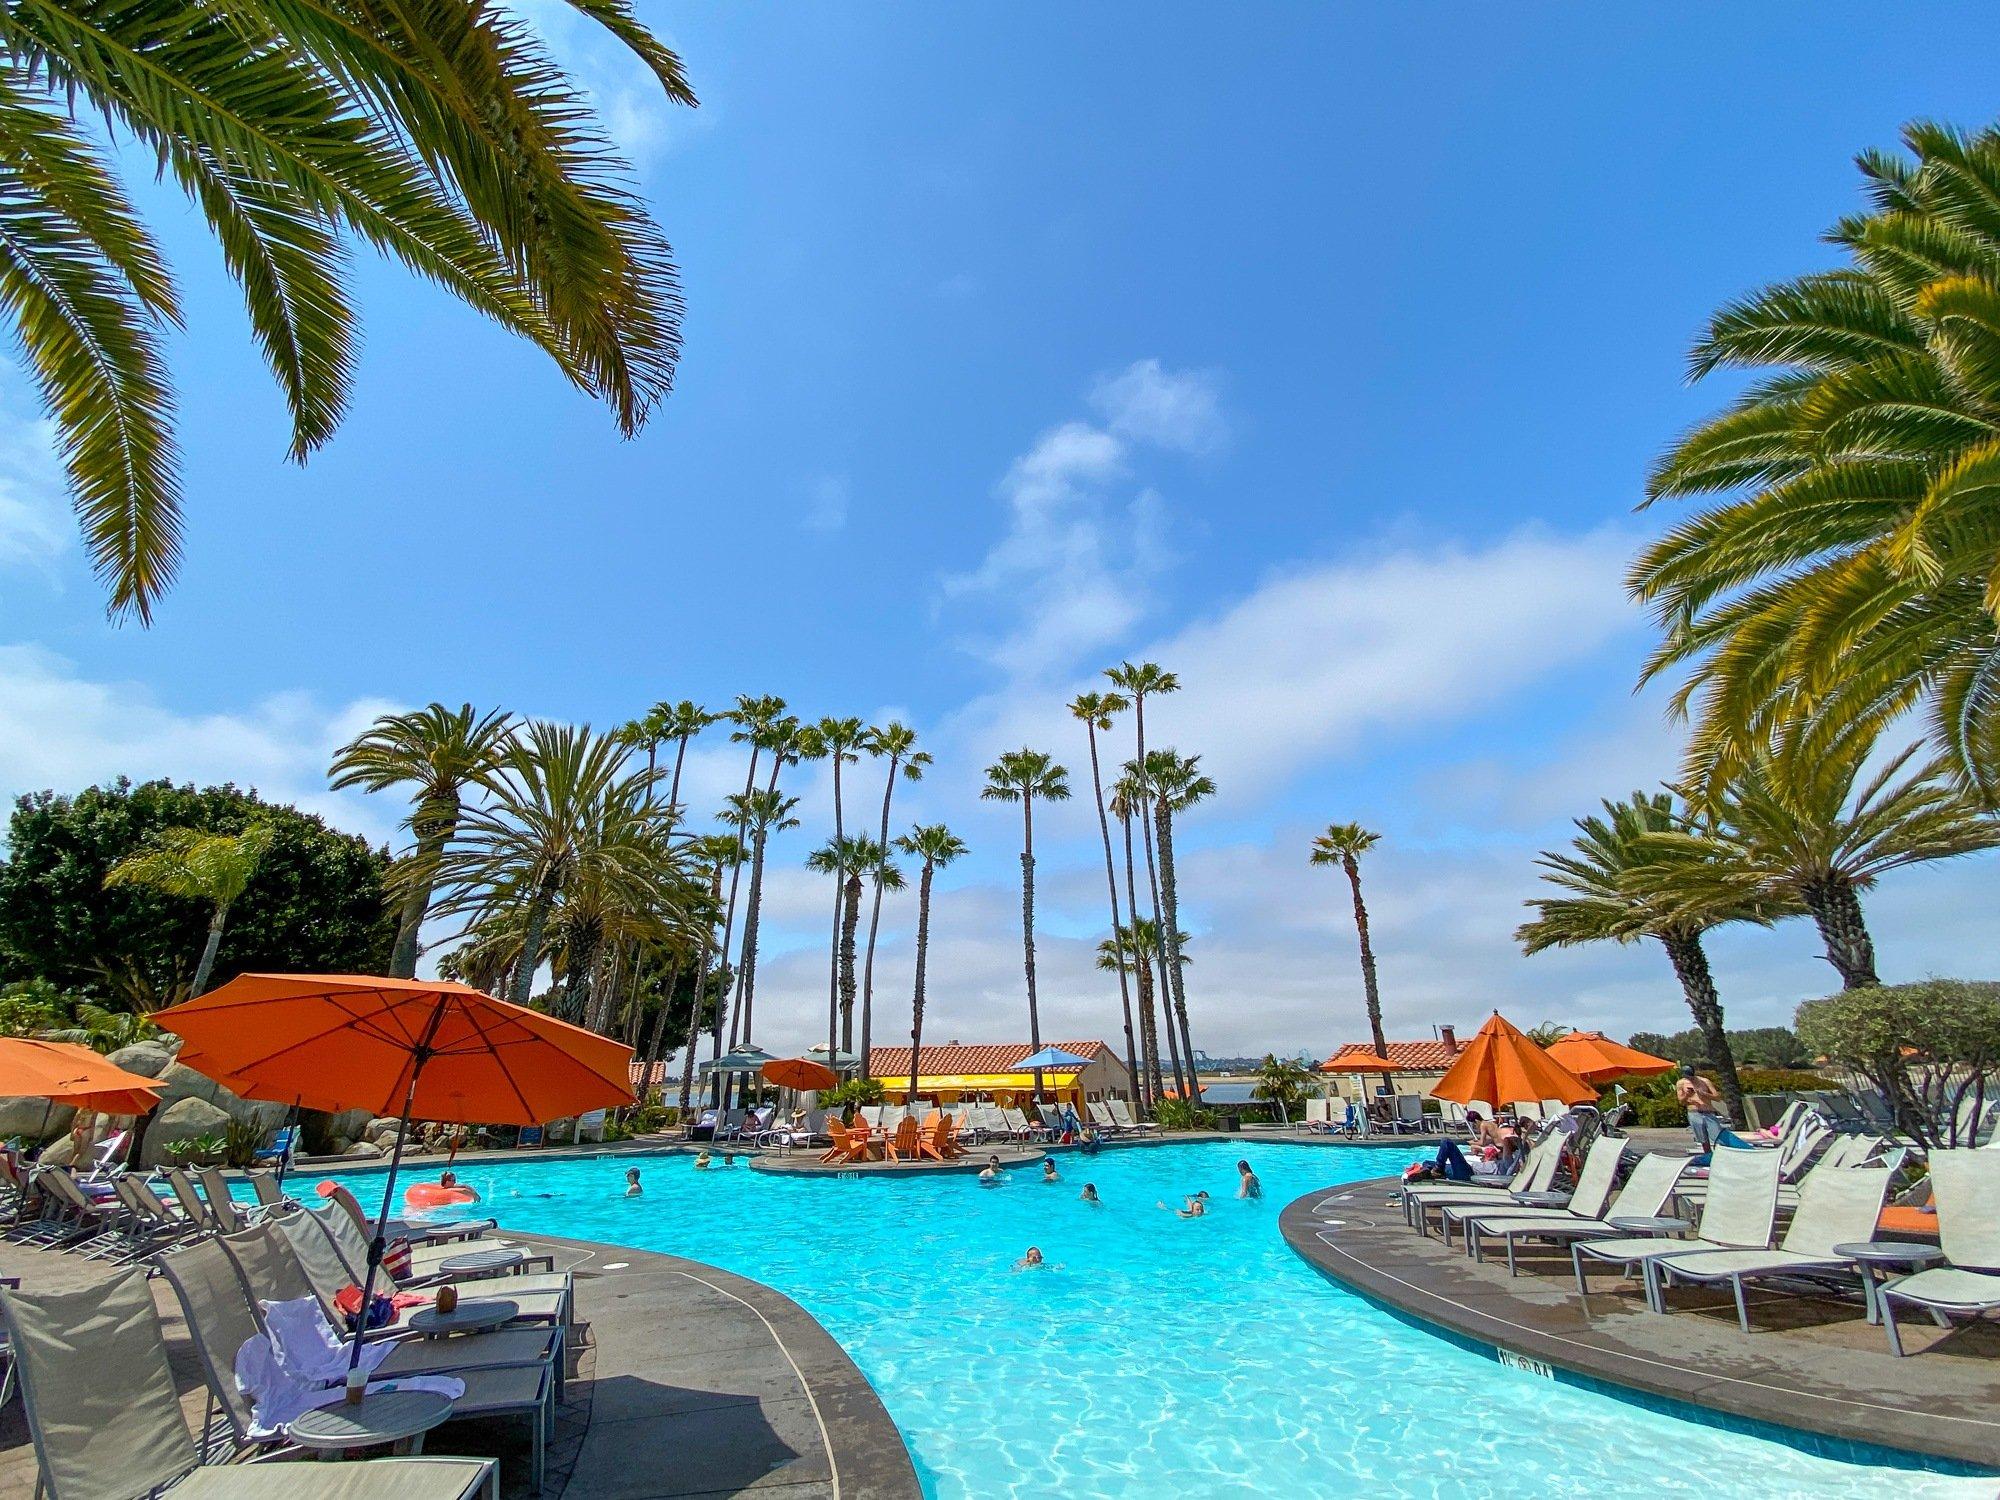 San Diego Mission Bay Resort zero-entry pool